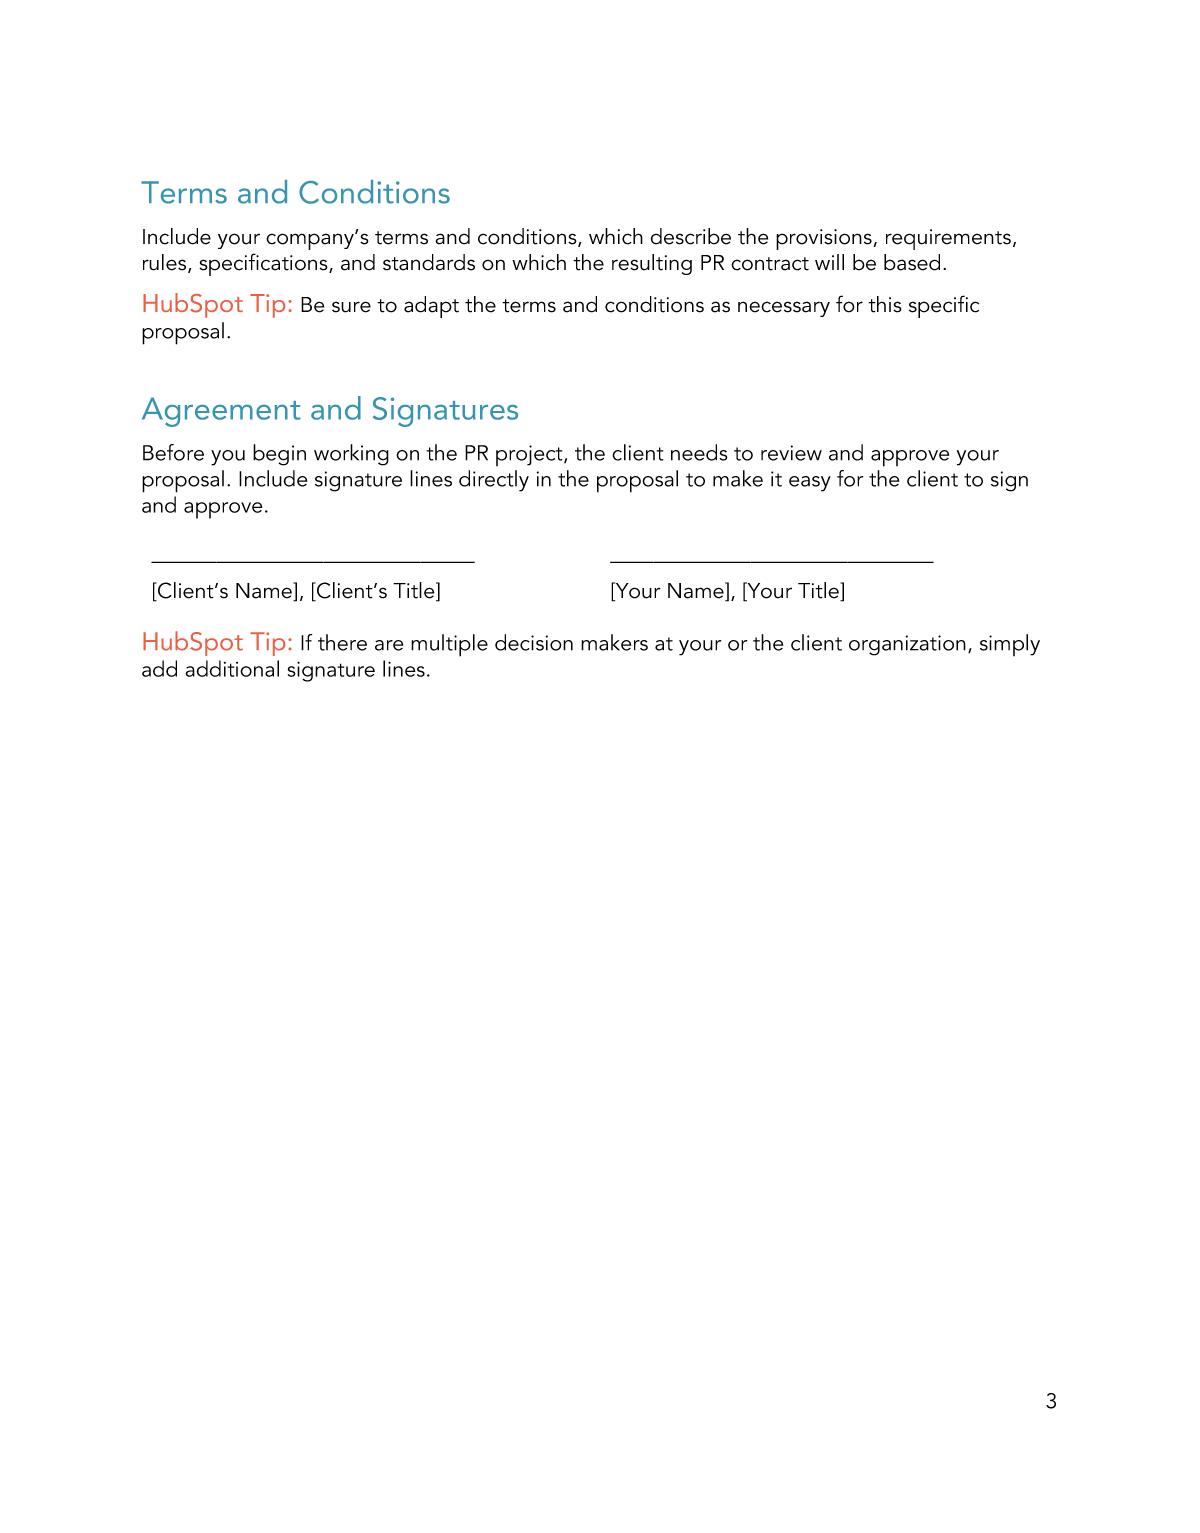 Free PR Proposal Template for PDF   Word   Google Docs   HubSpot